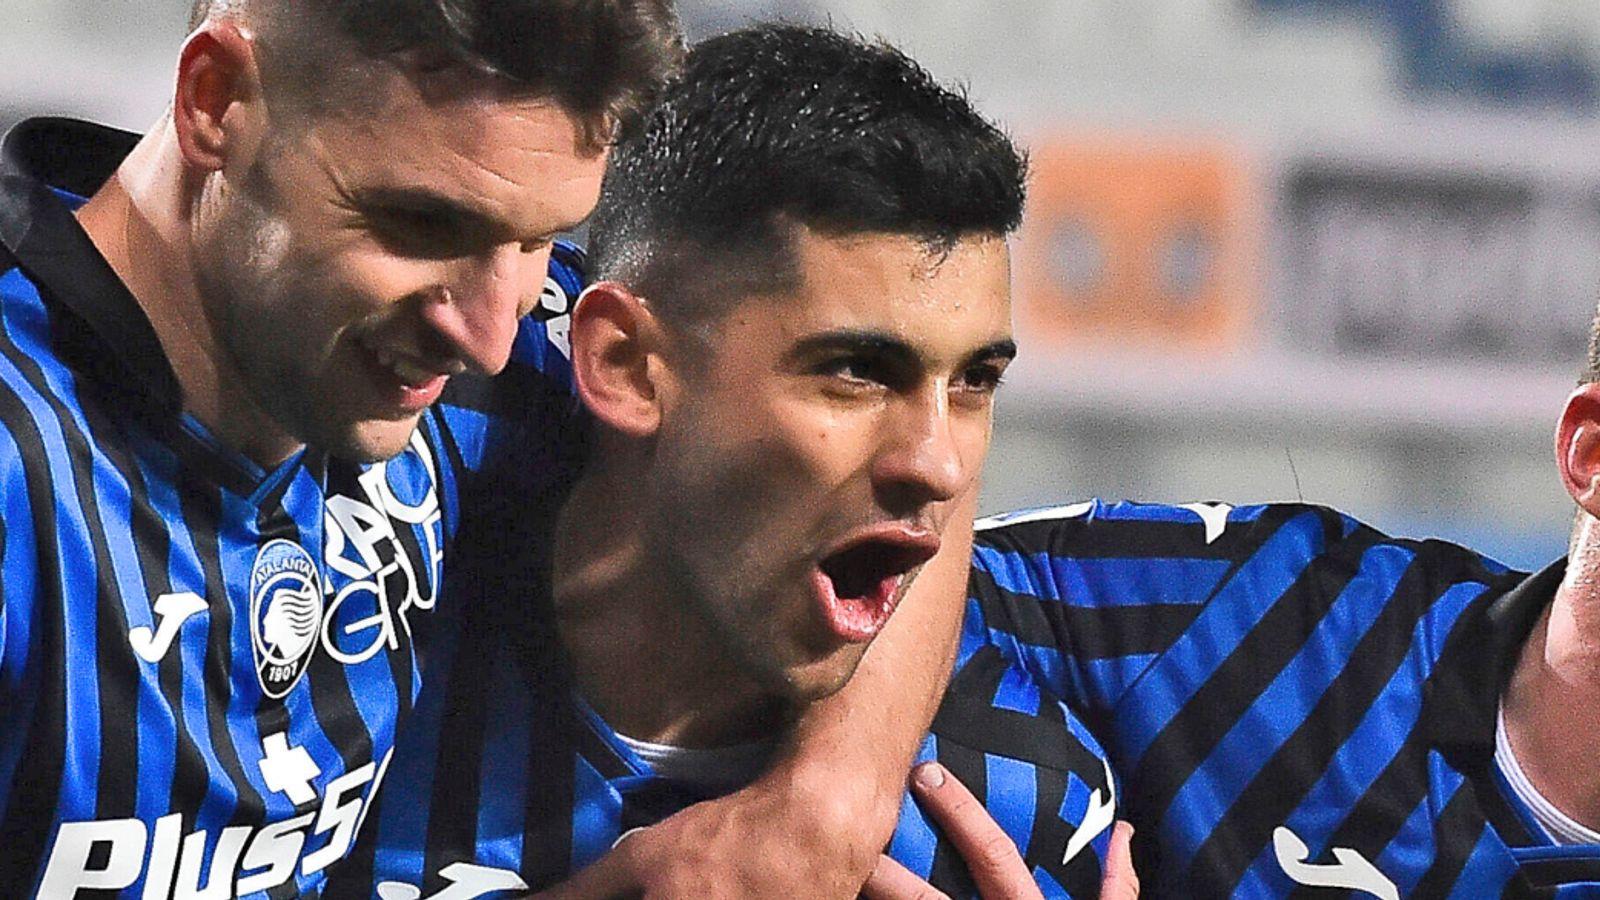 Tottenham transfer news: Cristian Romero completes medical ahead of £47m move from Atalanta